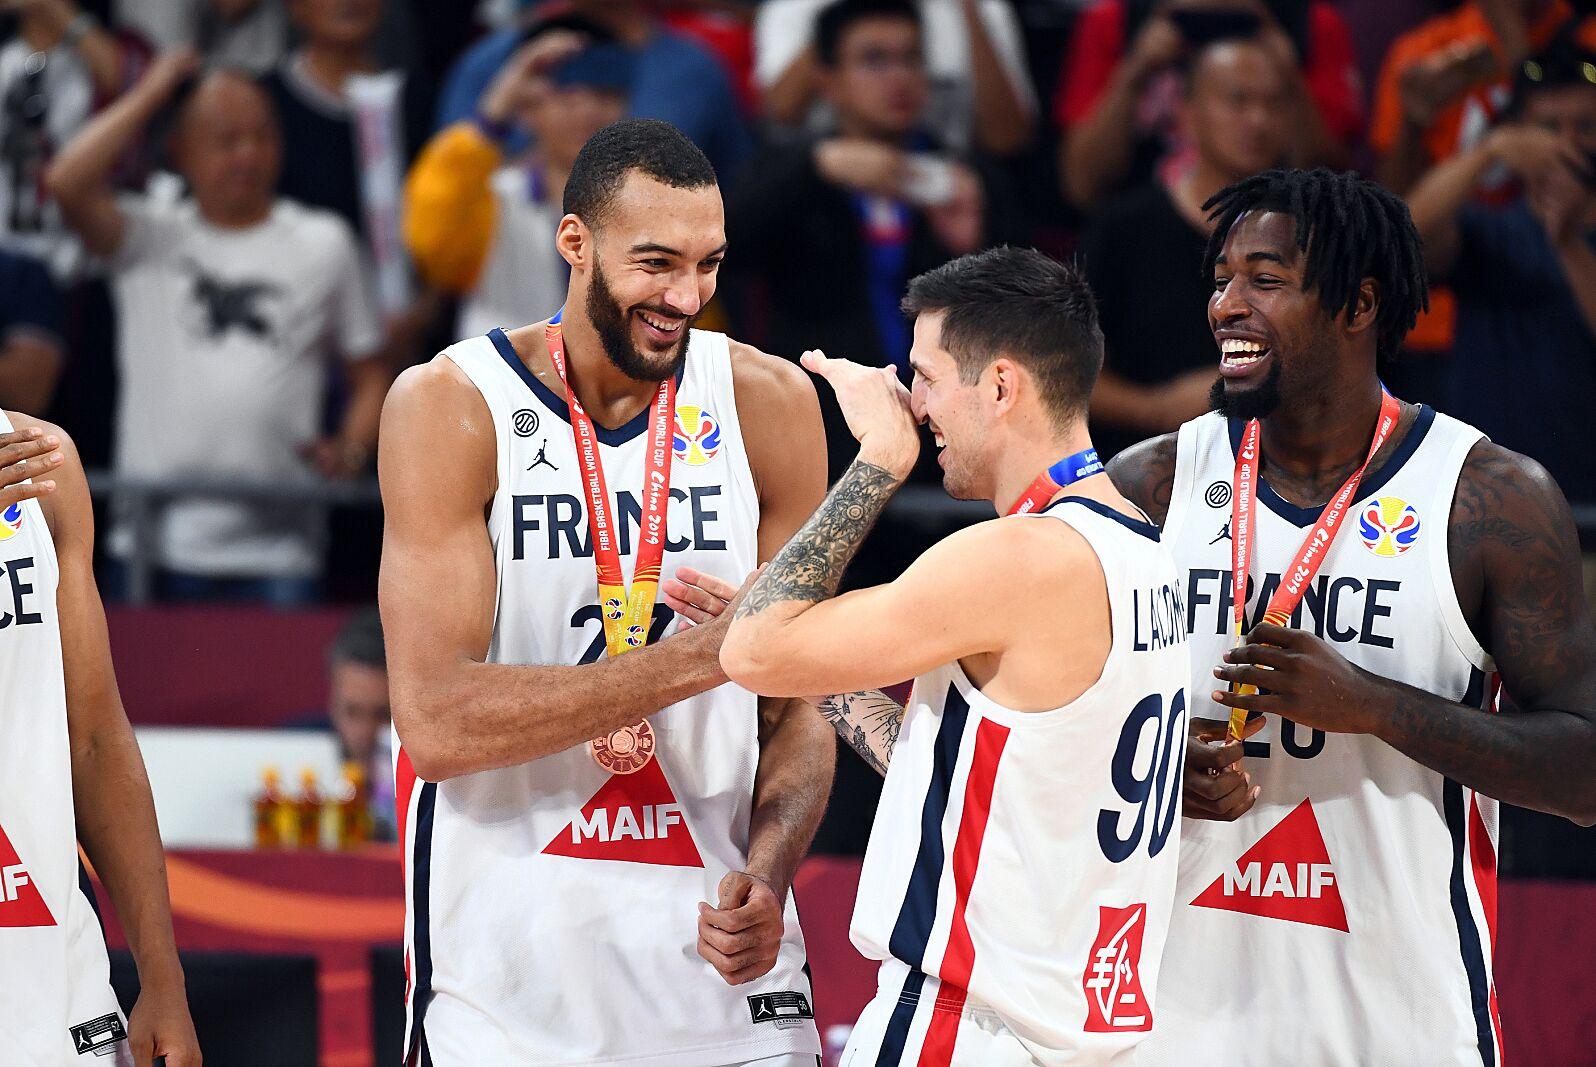 Utah Jazz: Reviewing the FIBA performances of current Jazzmen + Rubio